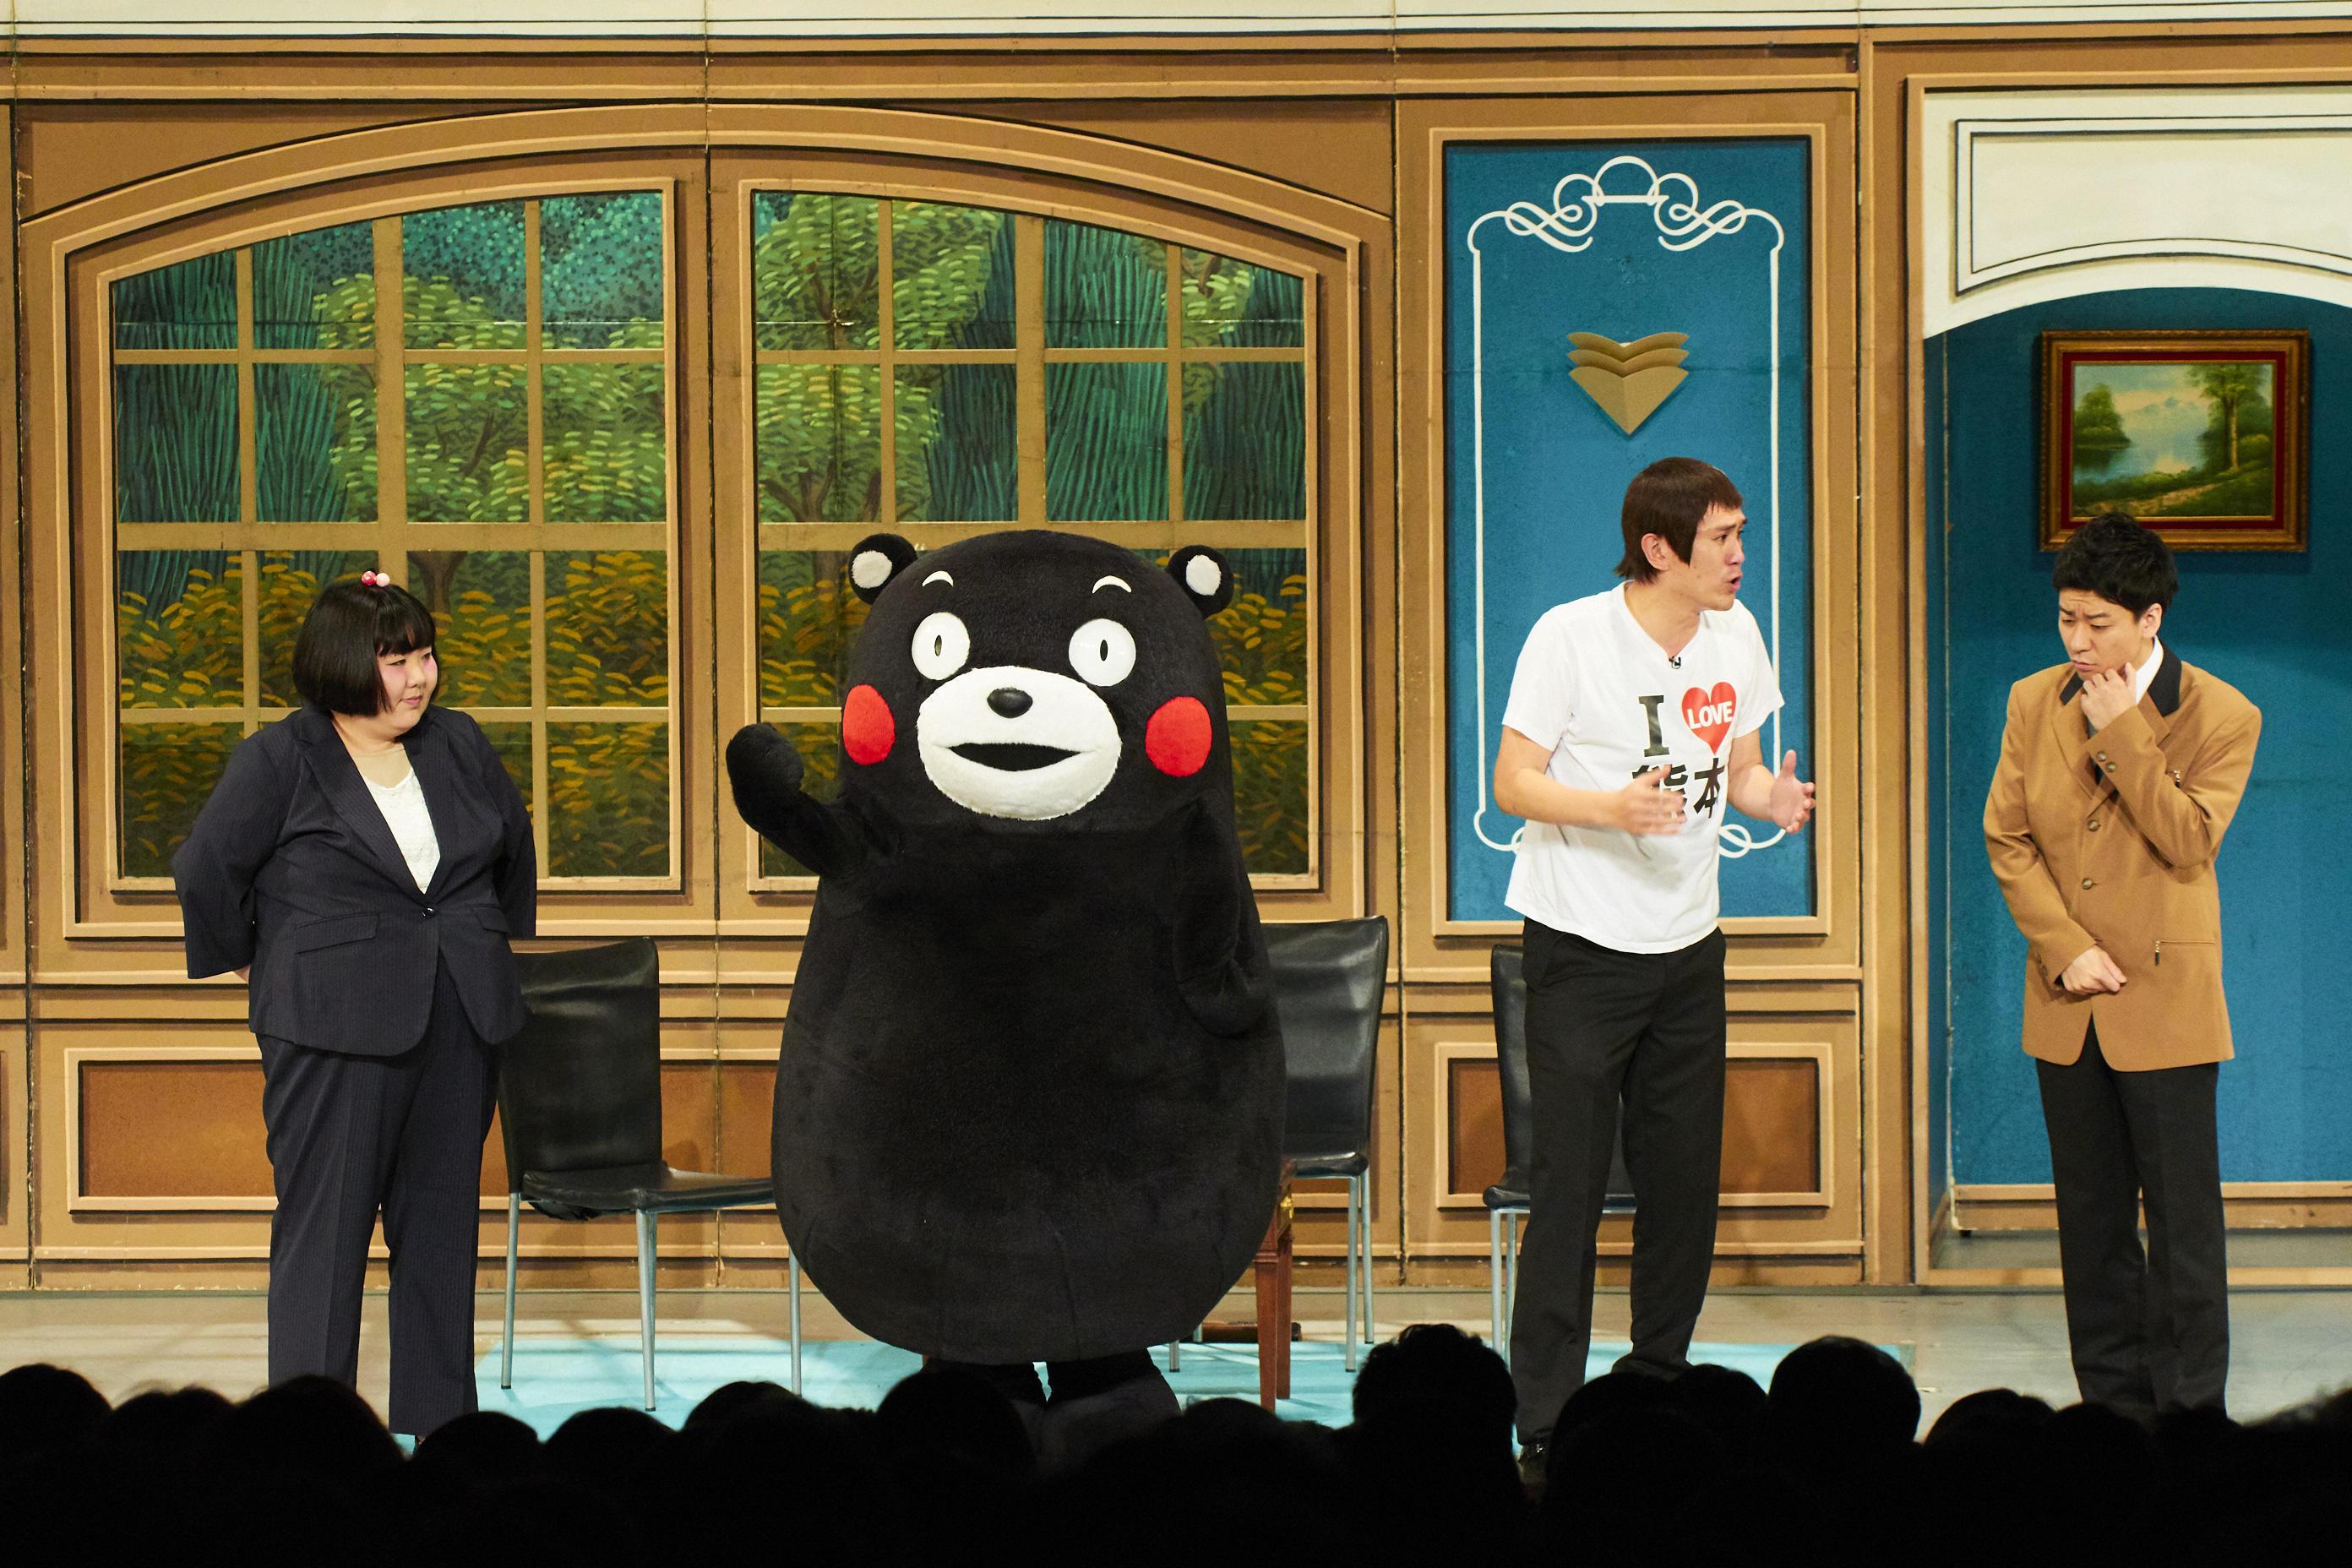 http://news.yoshimoto.co.jp/20180516003332-9909e8ba45b575747dc9aa6ae3aed4f4d748d441.jpg